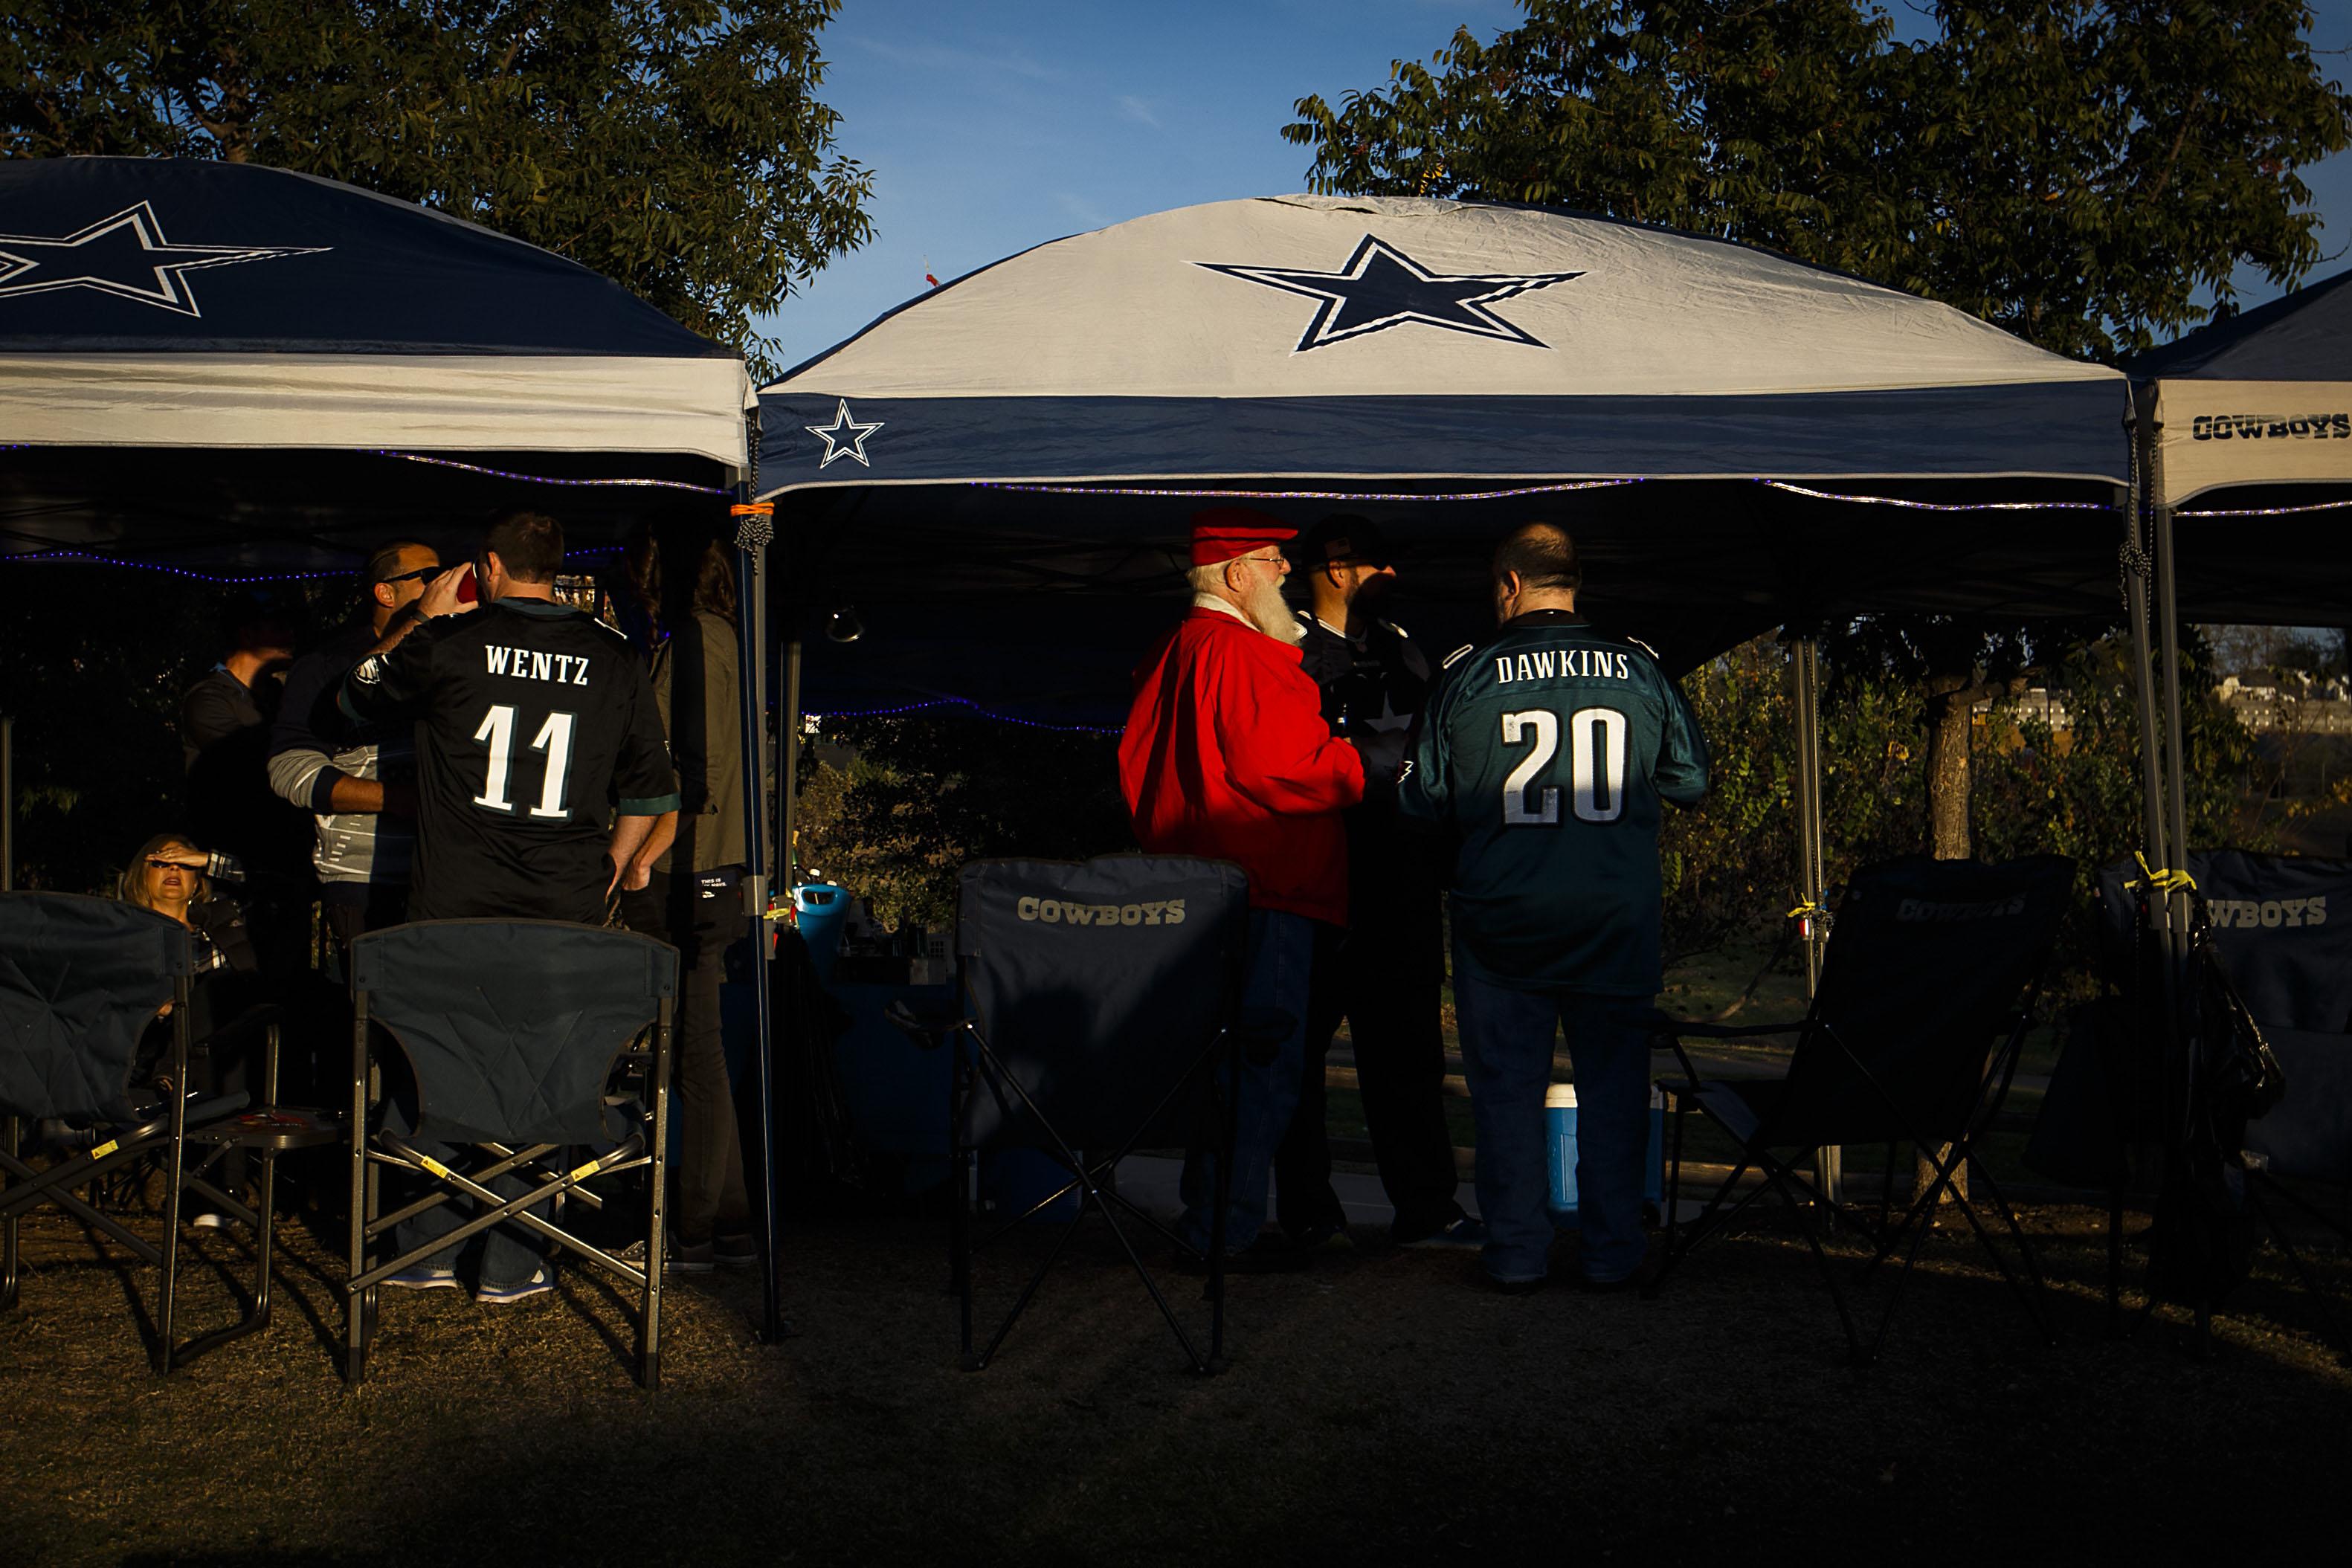 Dallas Cowboys Photos Dak Prescott honors late mom with cleats; Greg Abbott Chris Christie join Cowboys-Eagles | SportsDay & Dallas Cowboys: Photos: Dak Prescott honors late mom with cleats ...